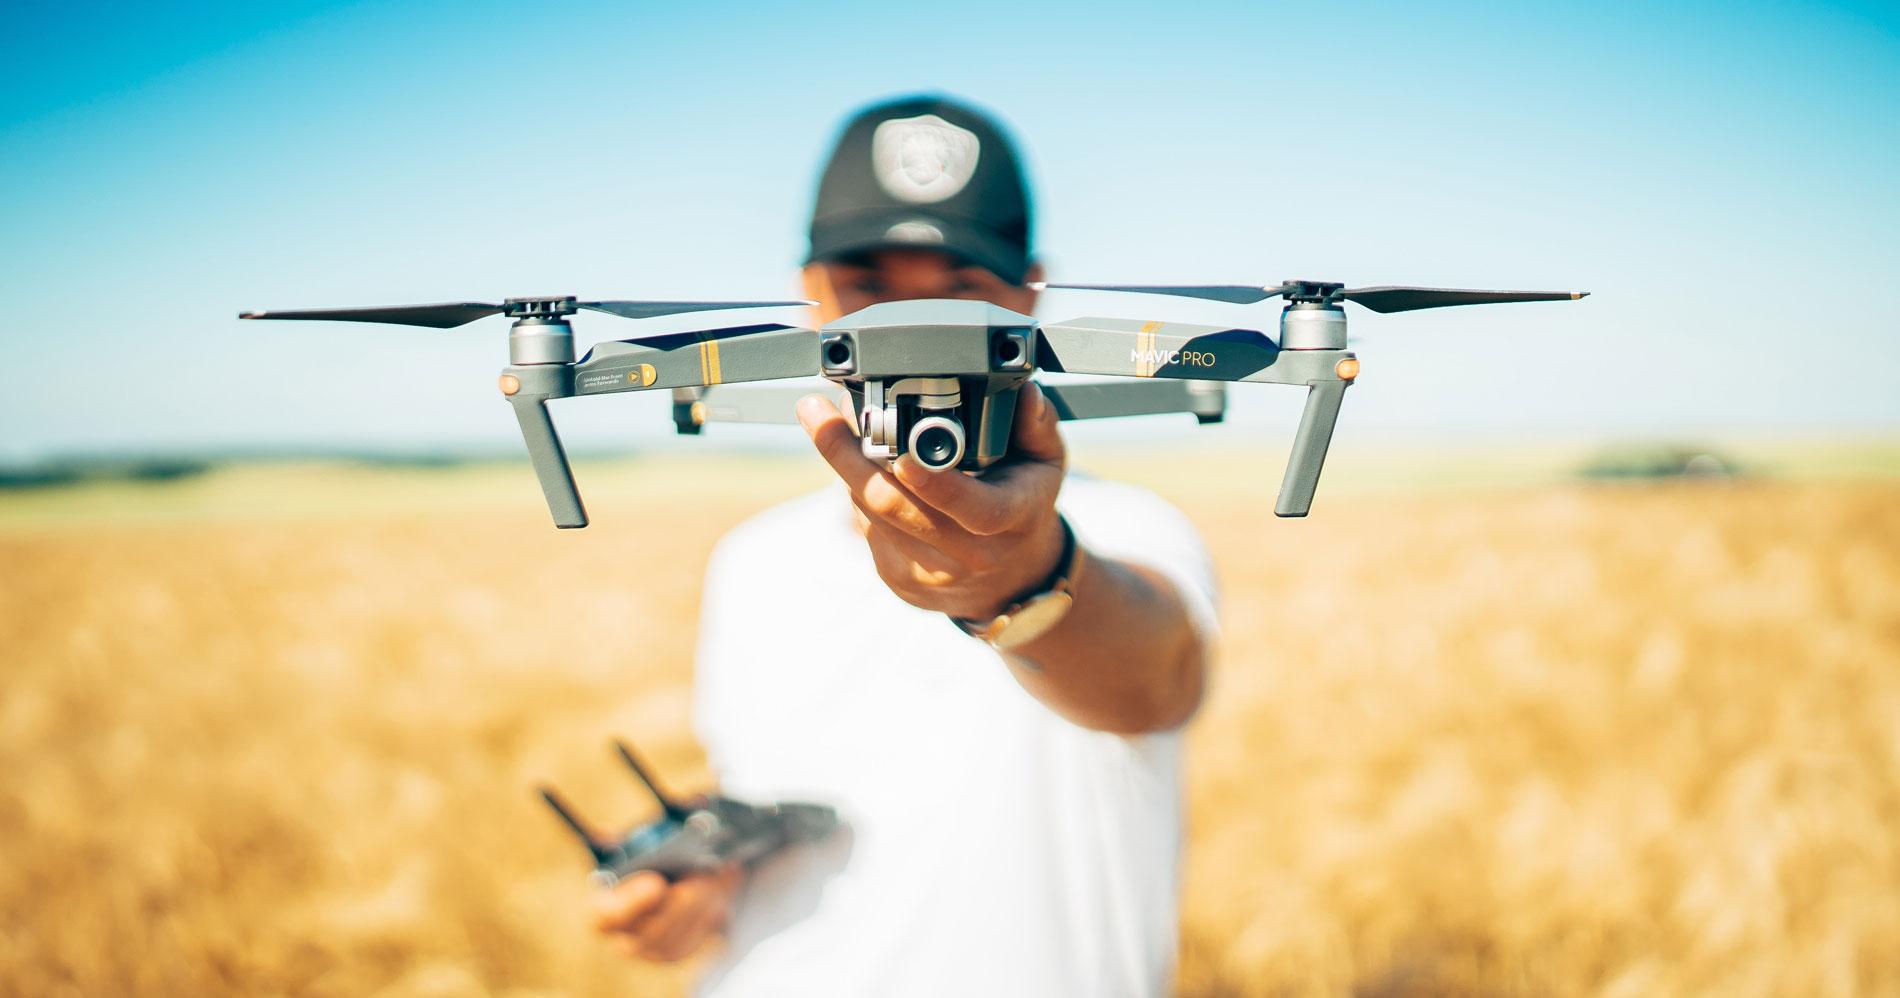 Mavic Pro Platinum Drone with a 4K camera